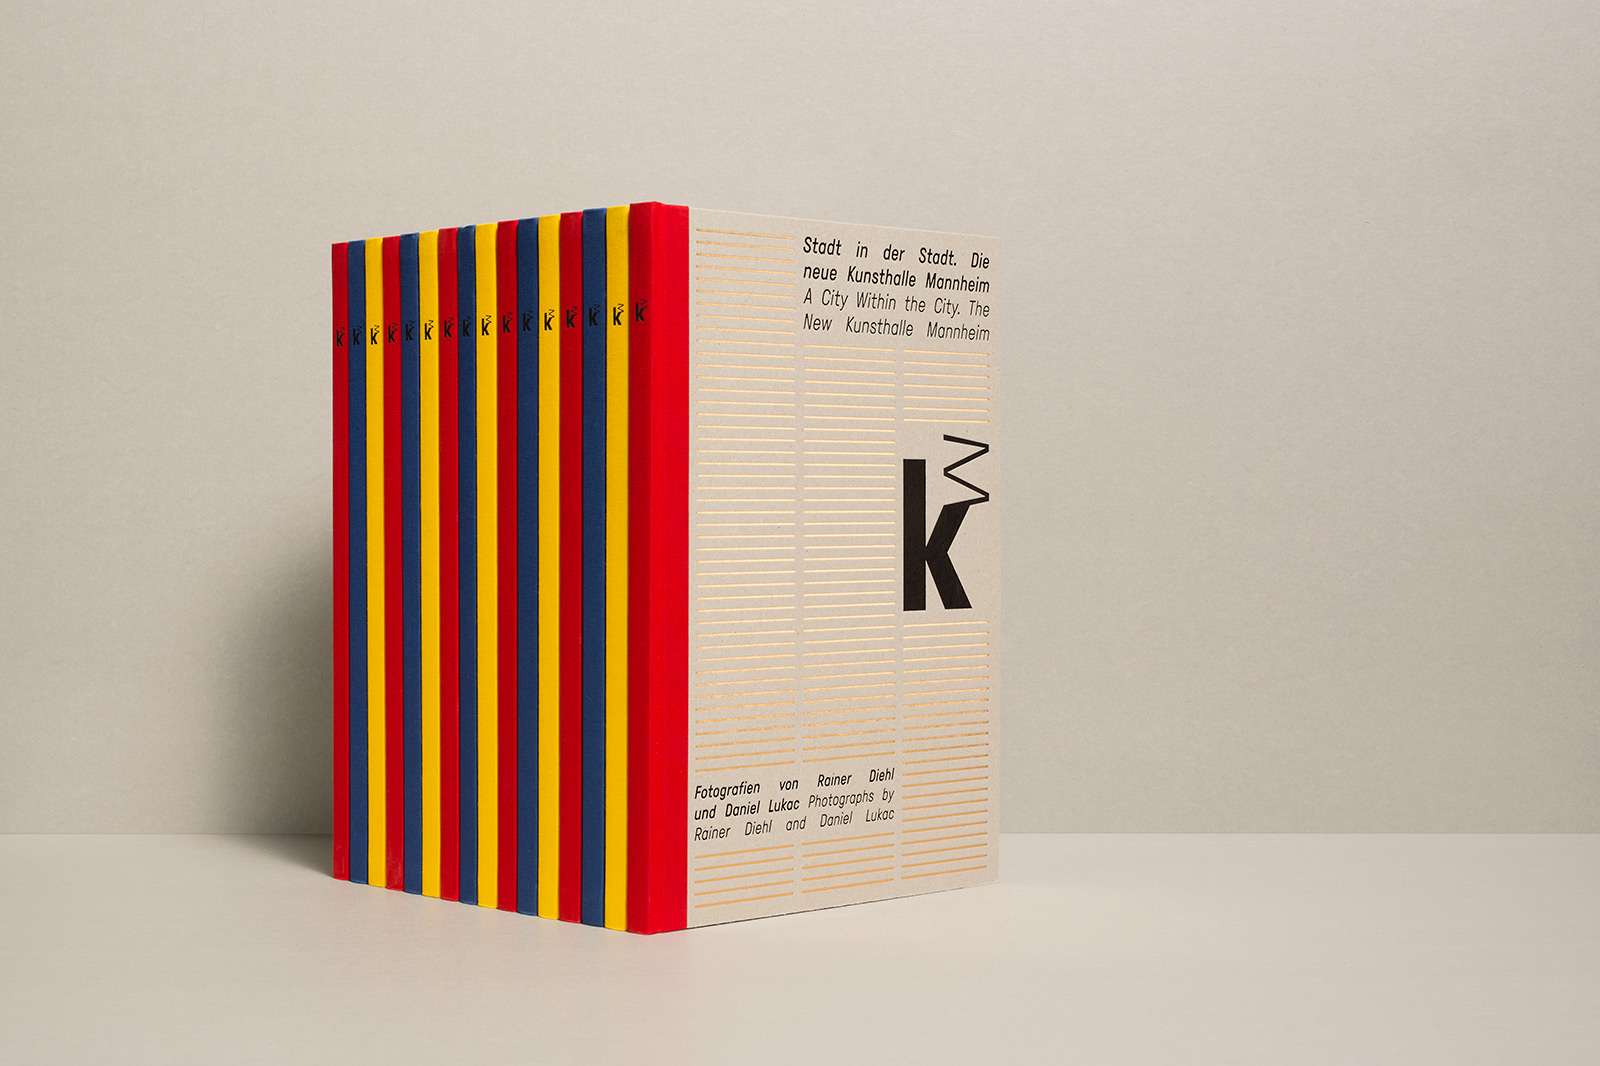 Buch-Repro1078.jpg